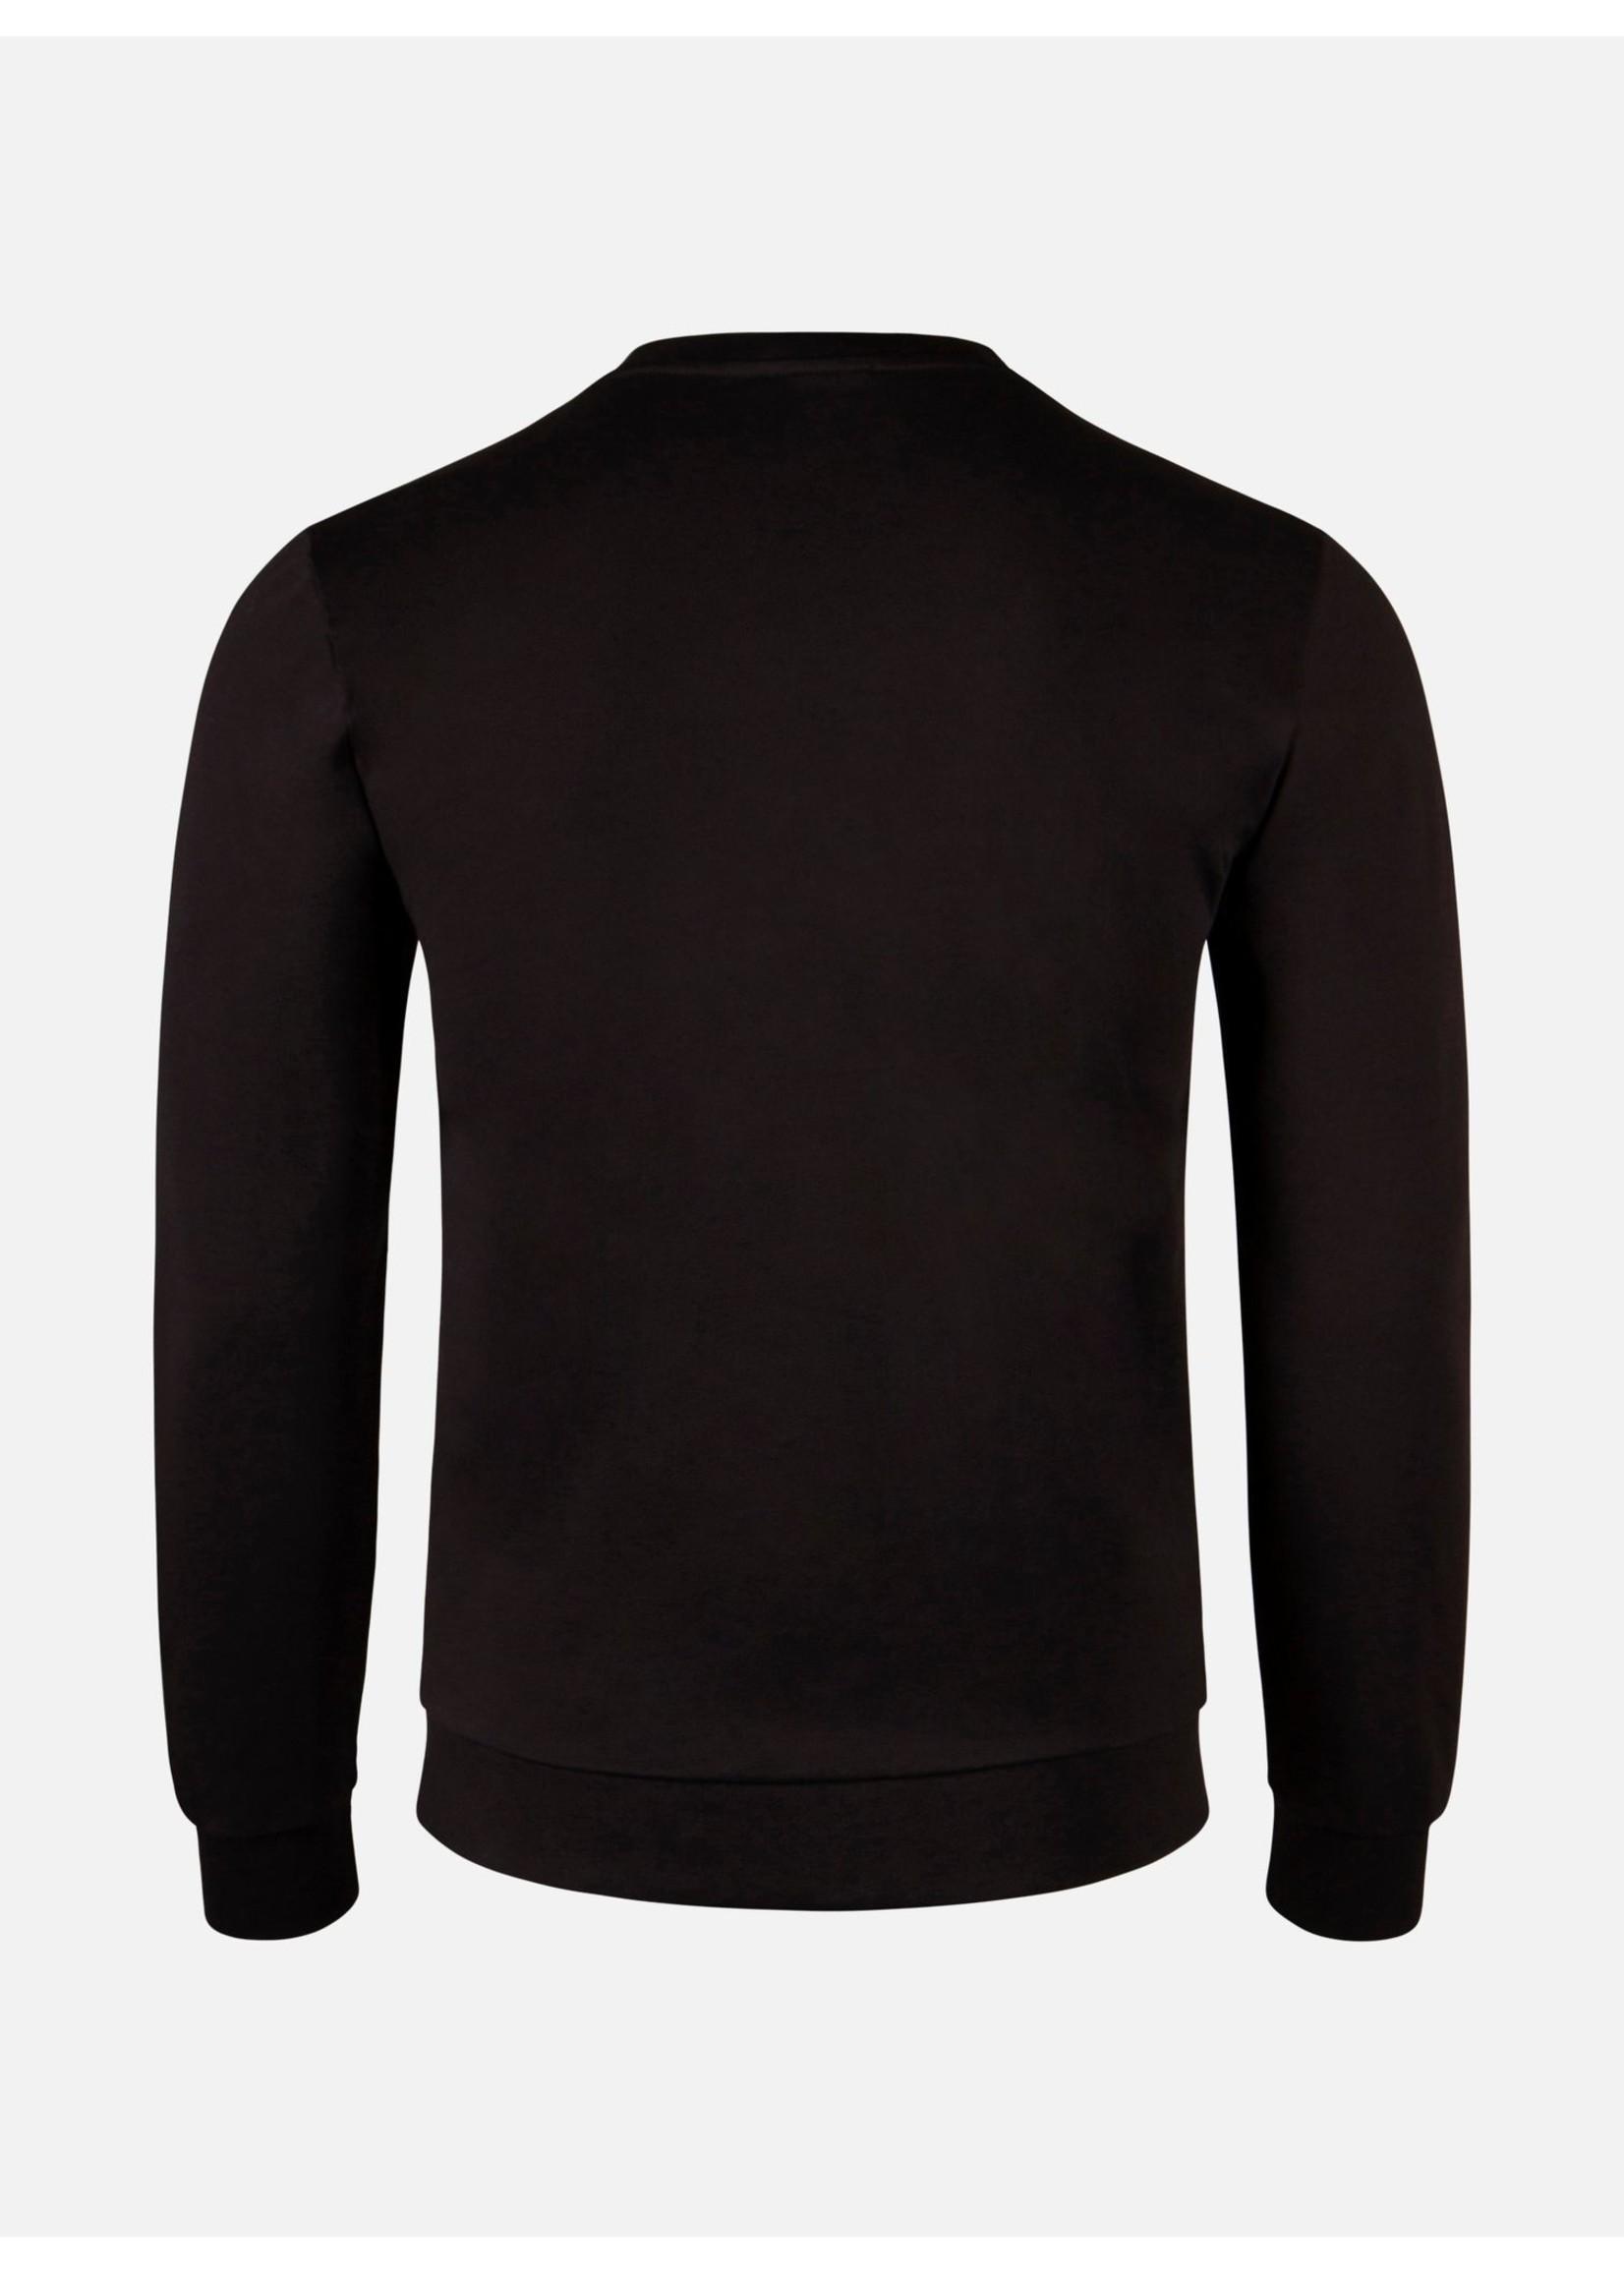 RADICAL Luigi Crewneck Sweater - Black